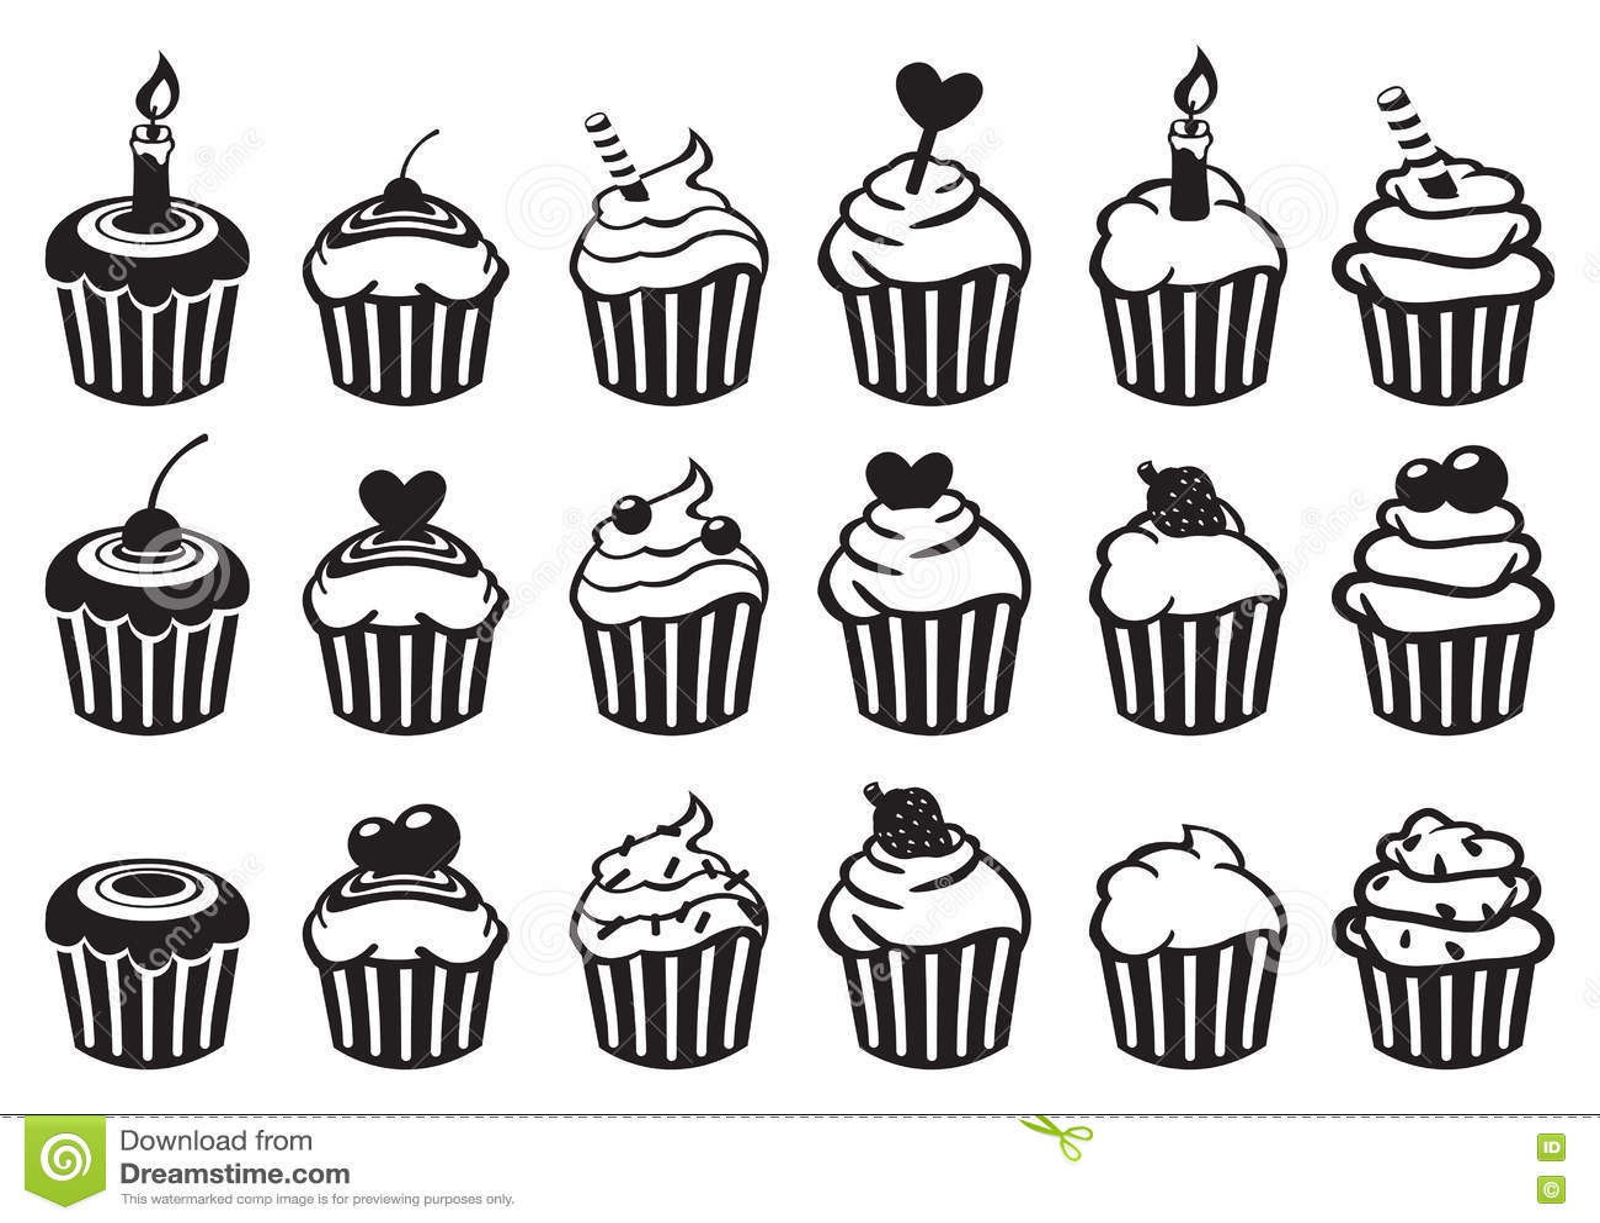 Black And White Cupcake Vector Icon Set Stock Vector